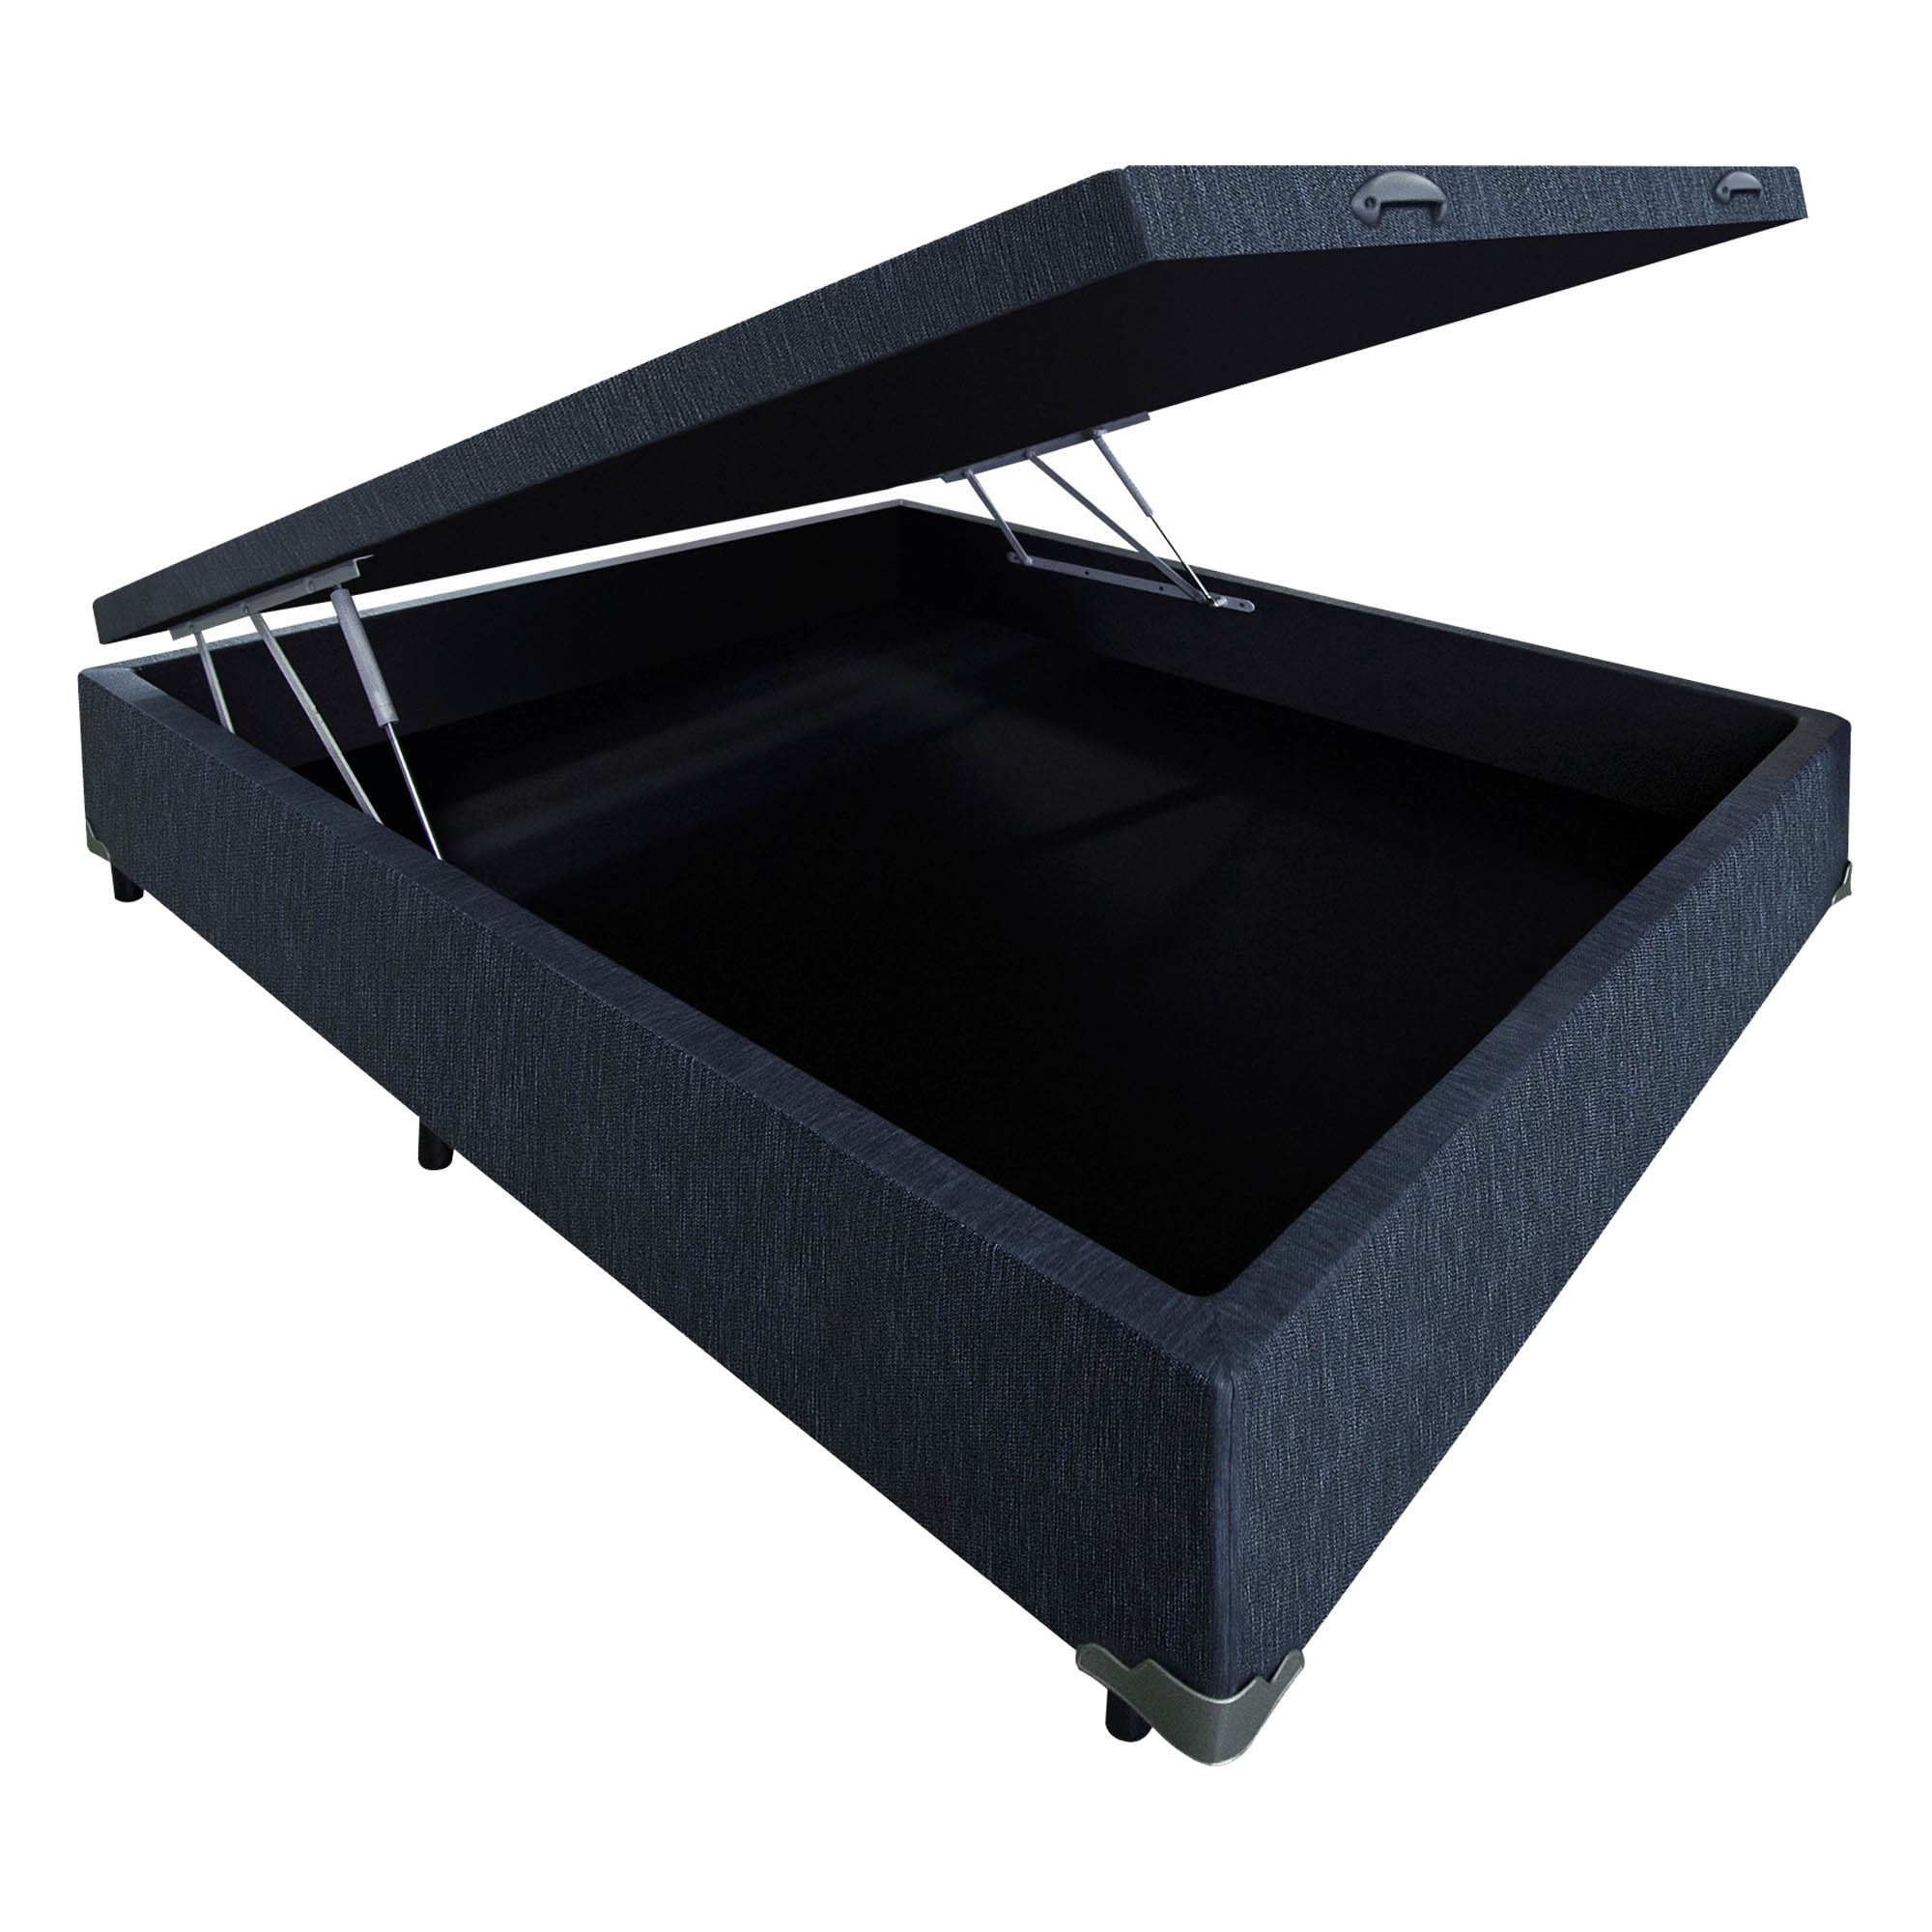 Box Baú Linhão Cosmo [Viúva 128 x 188 cm]